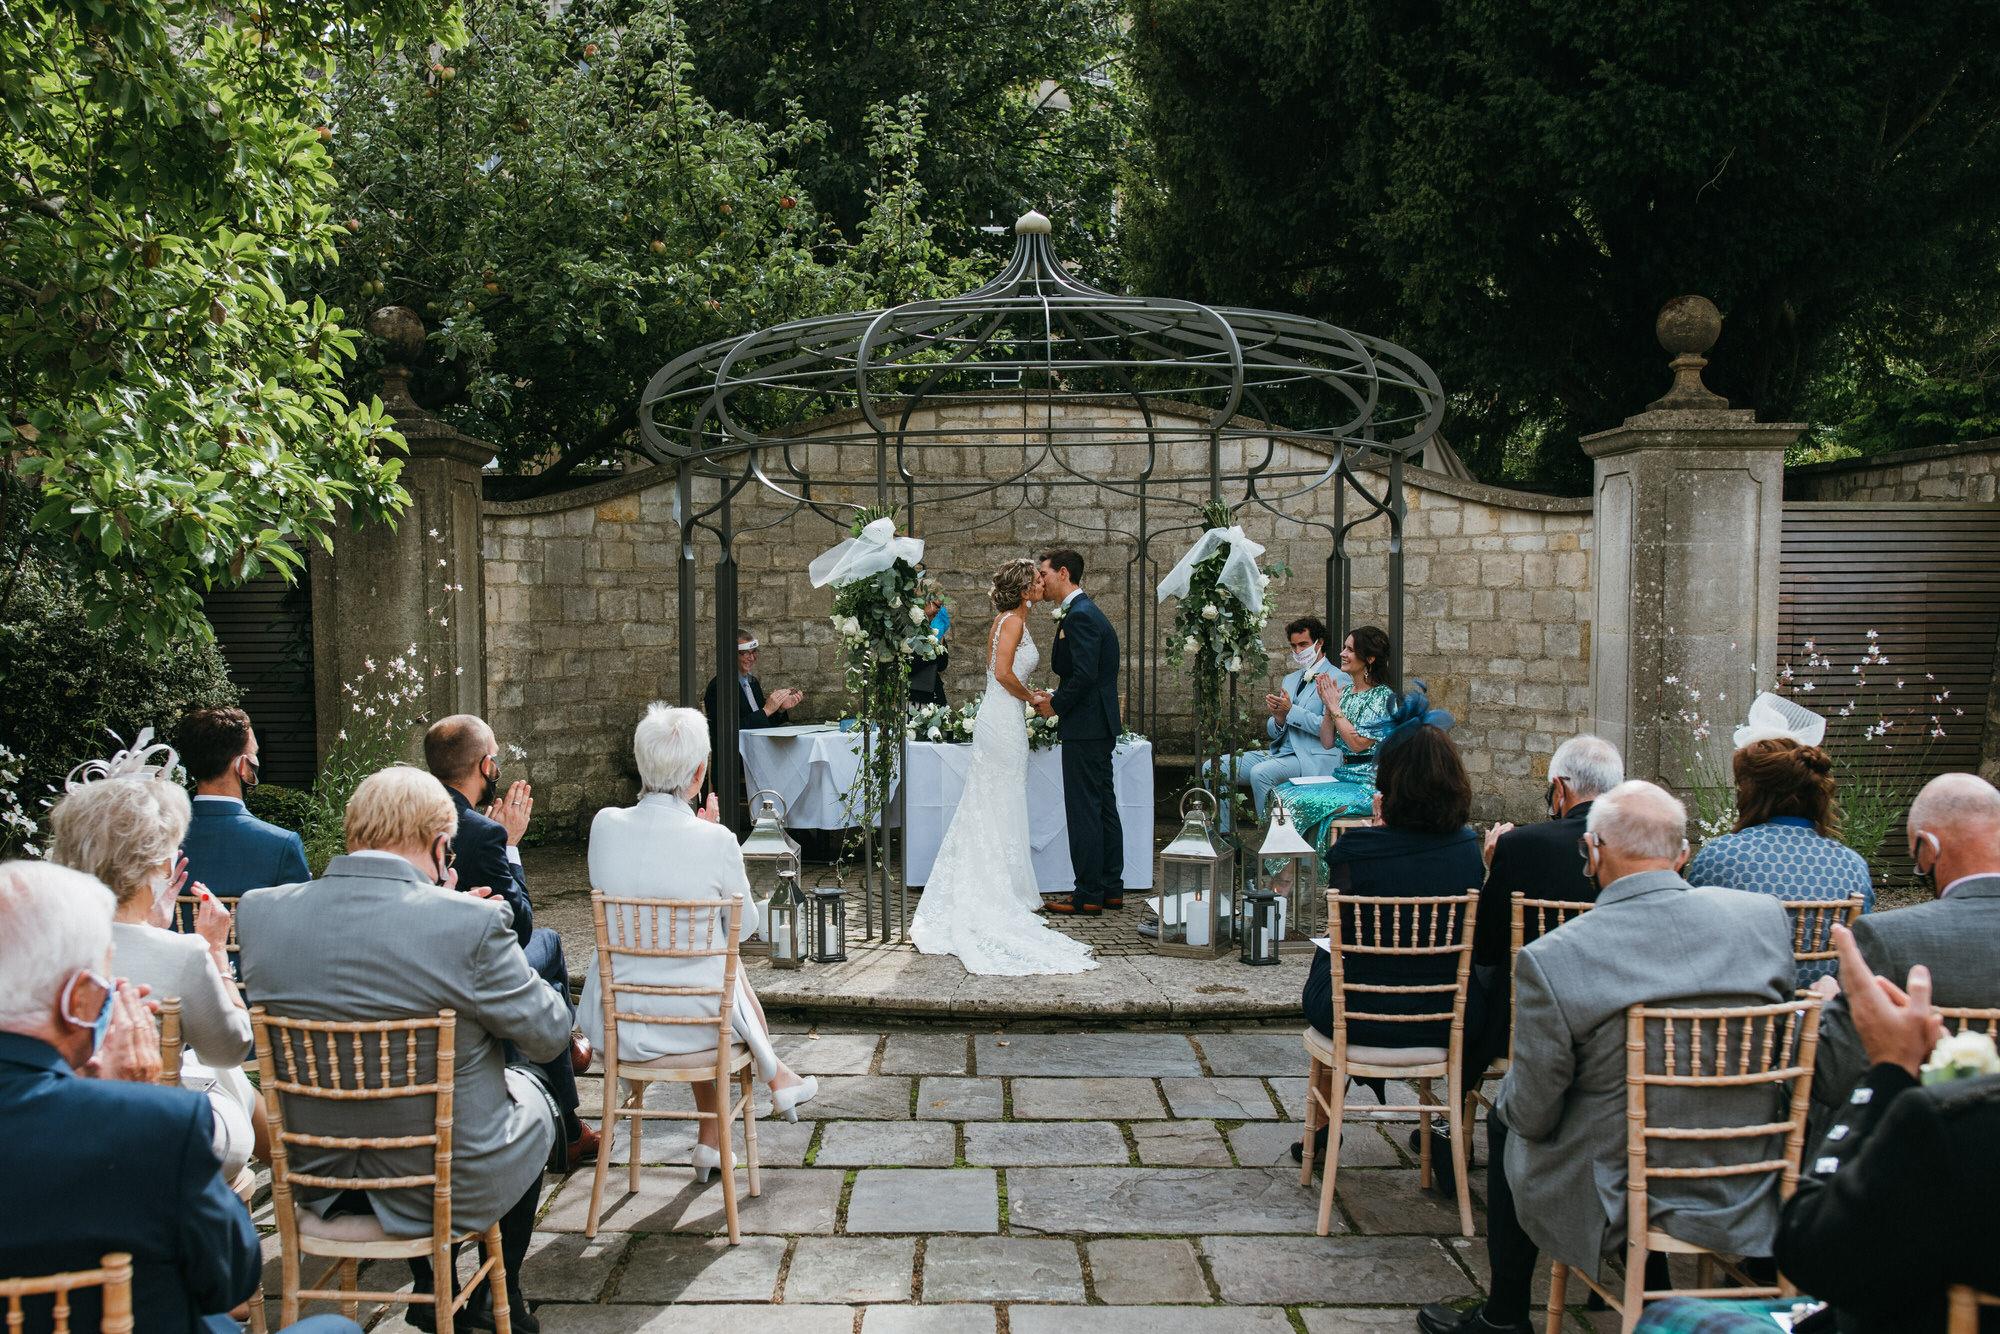 Royal crescent hotel wedding ceremony